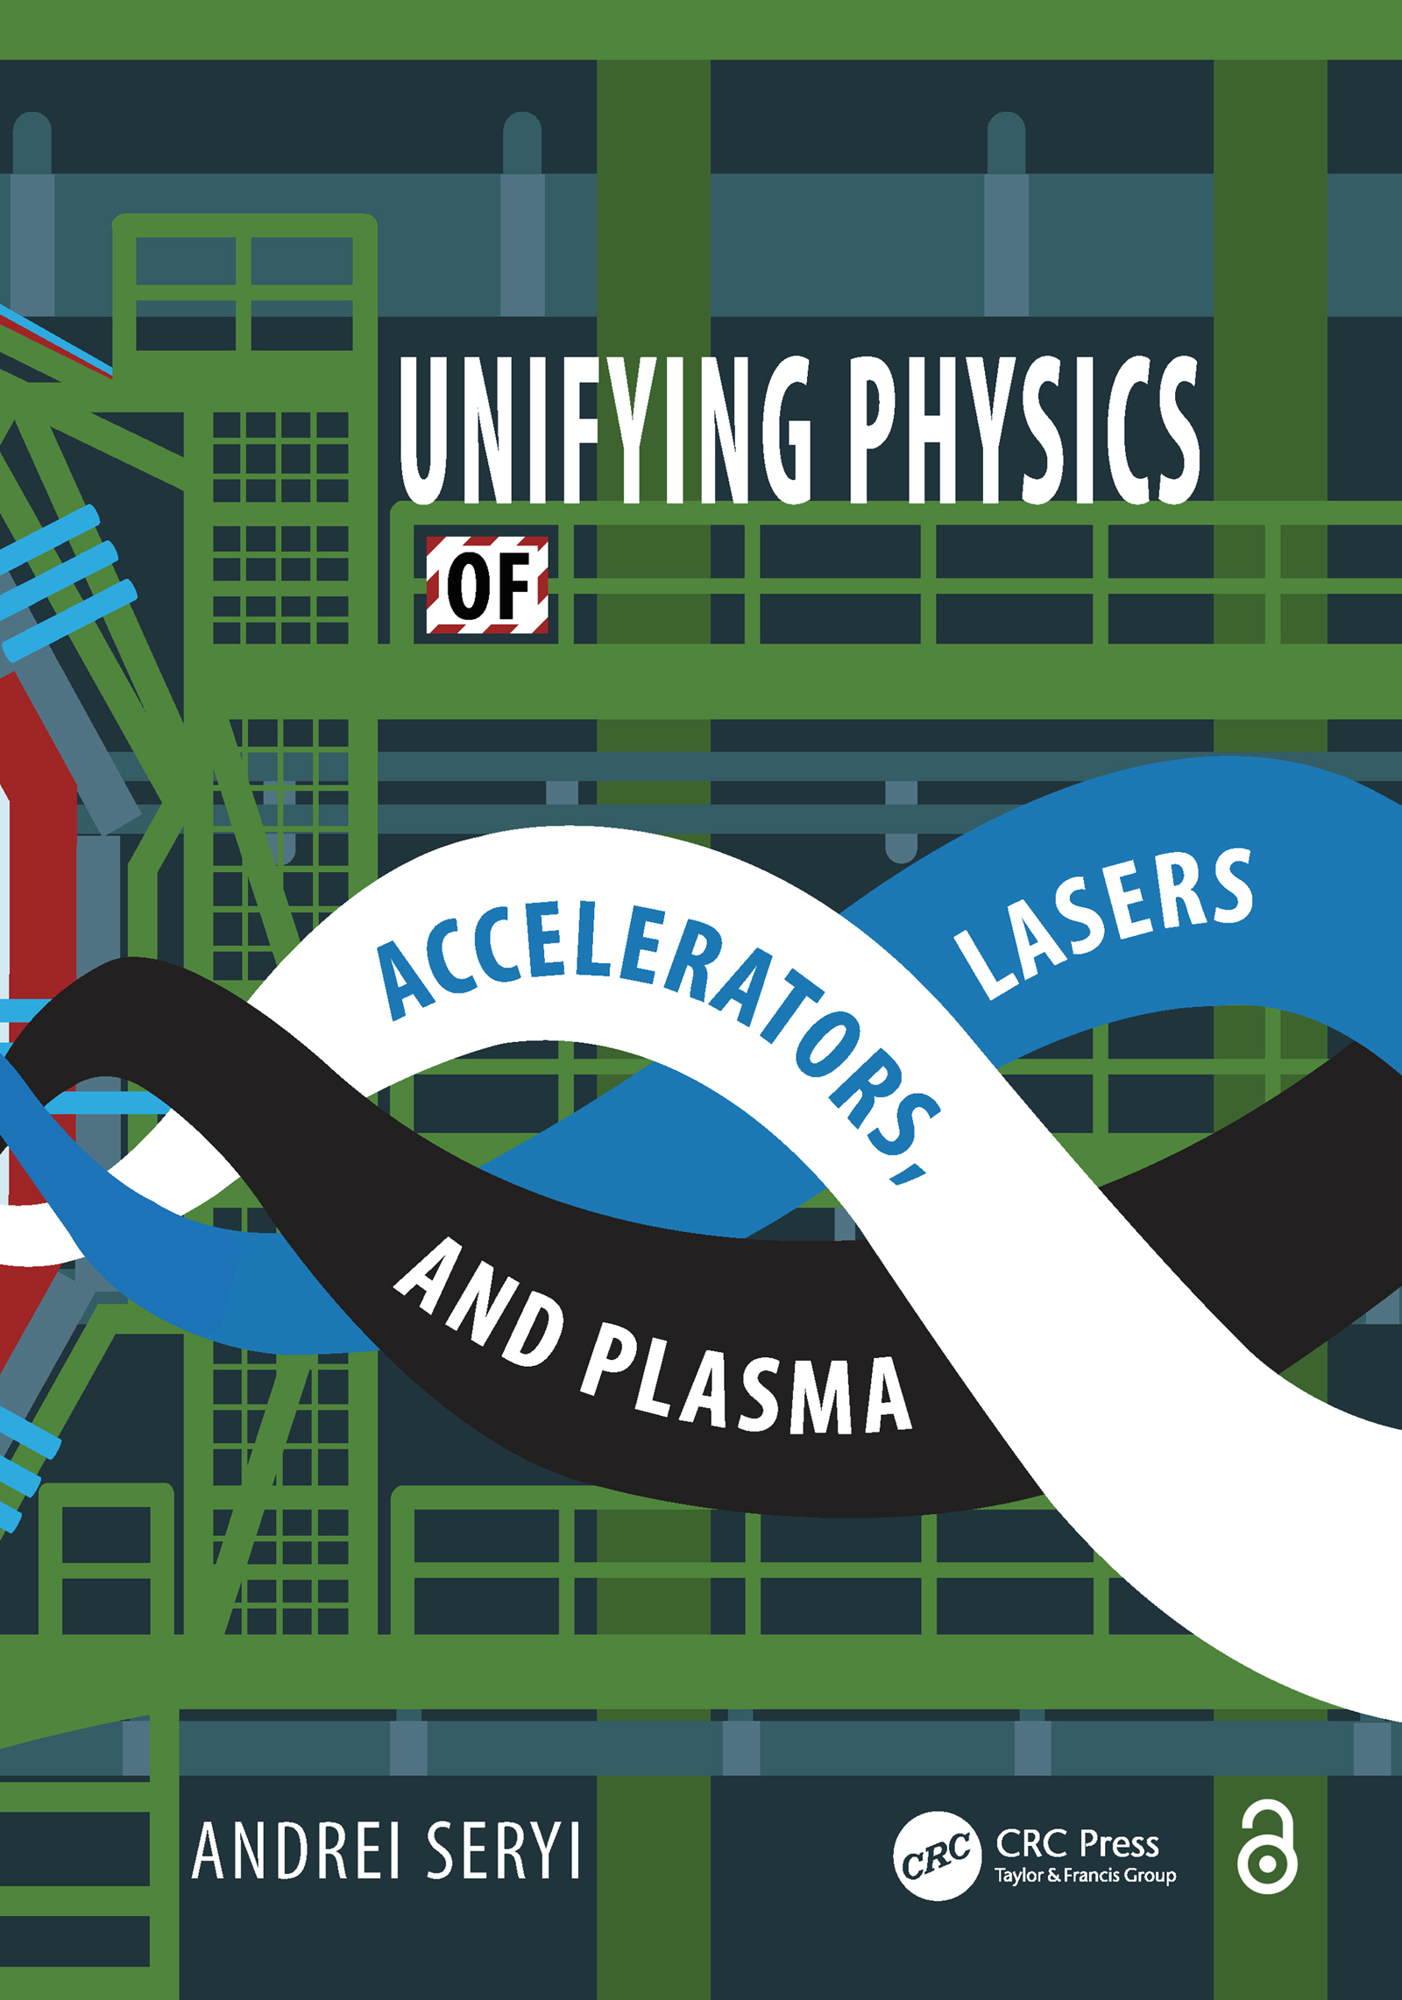 Unifying Physics of Accelerators, Lasers and Plasma